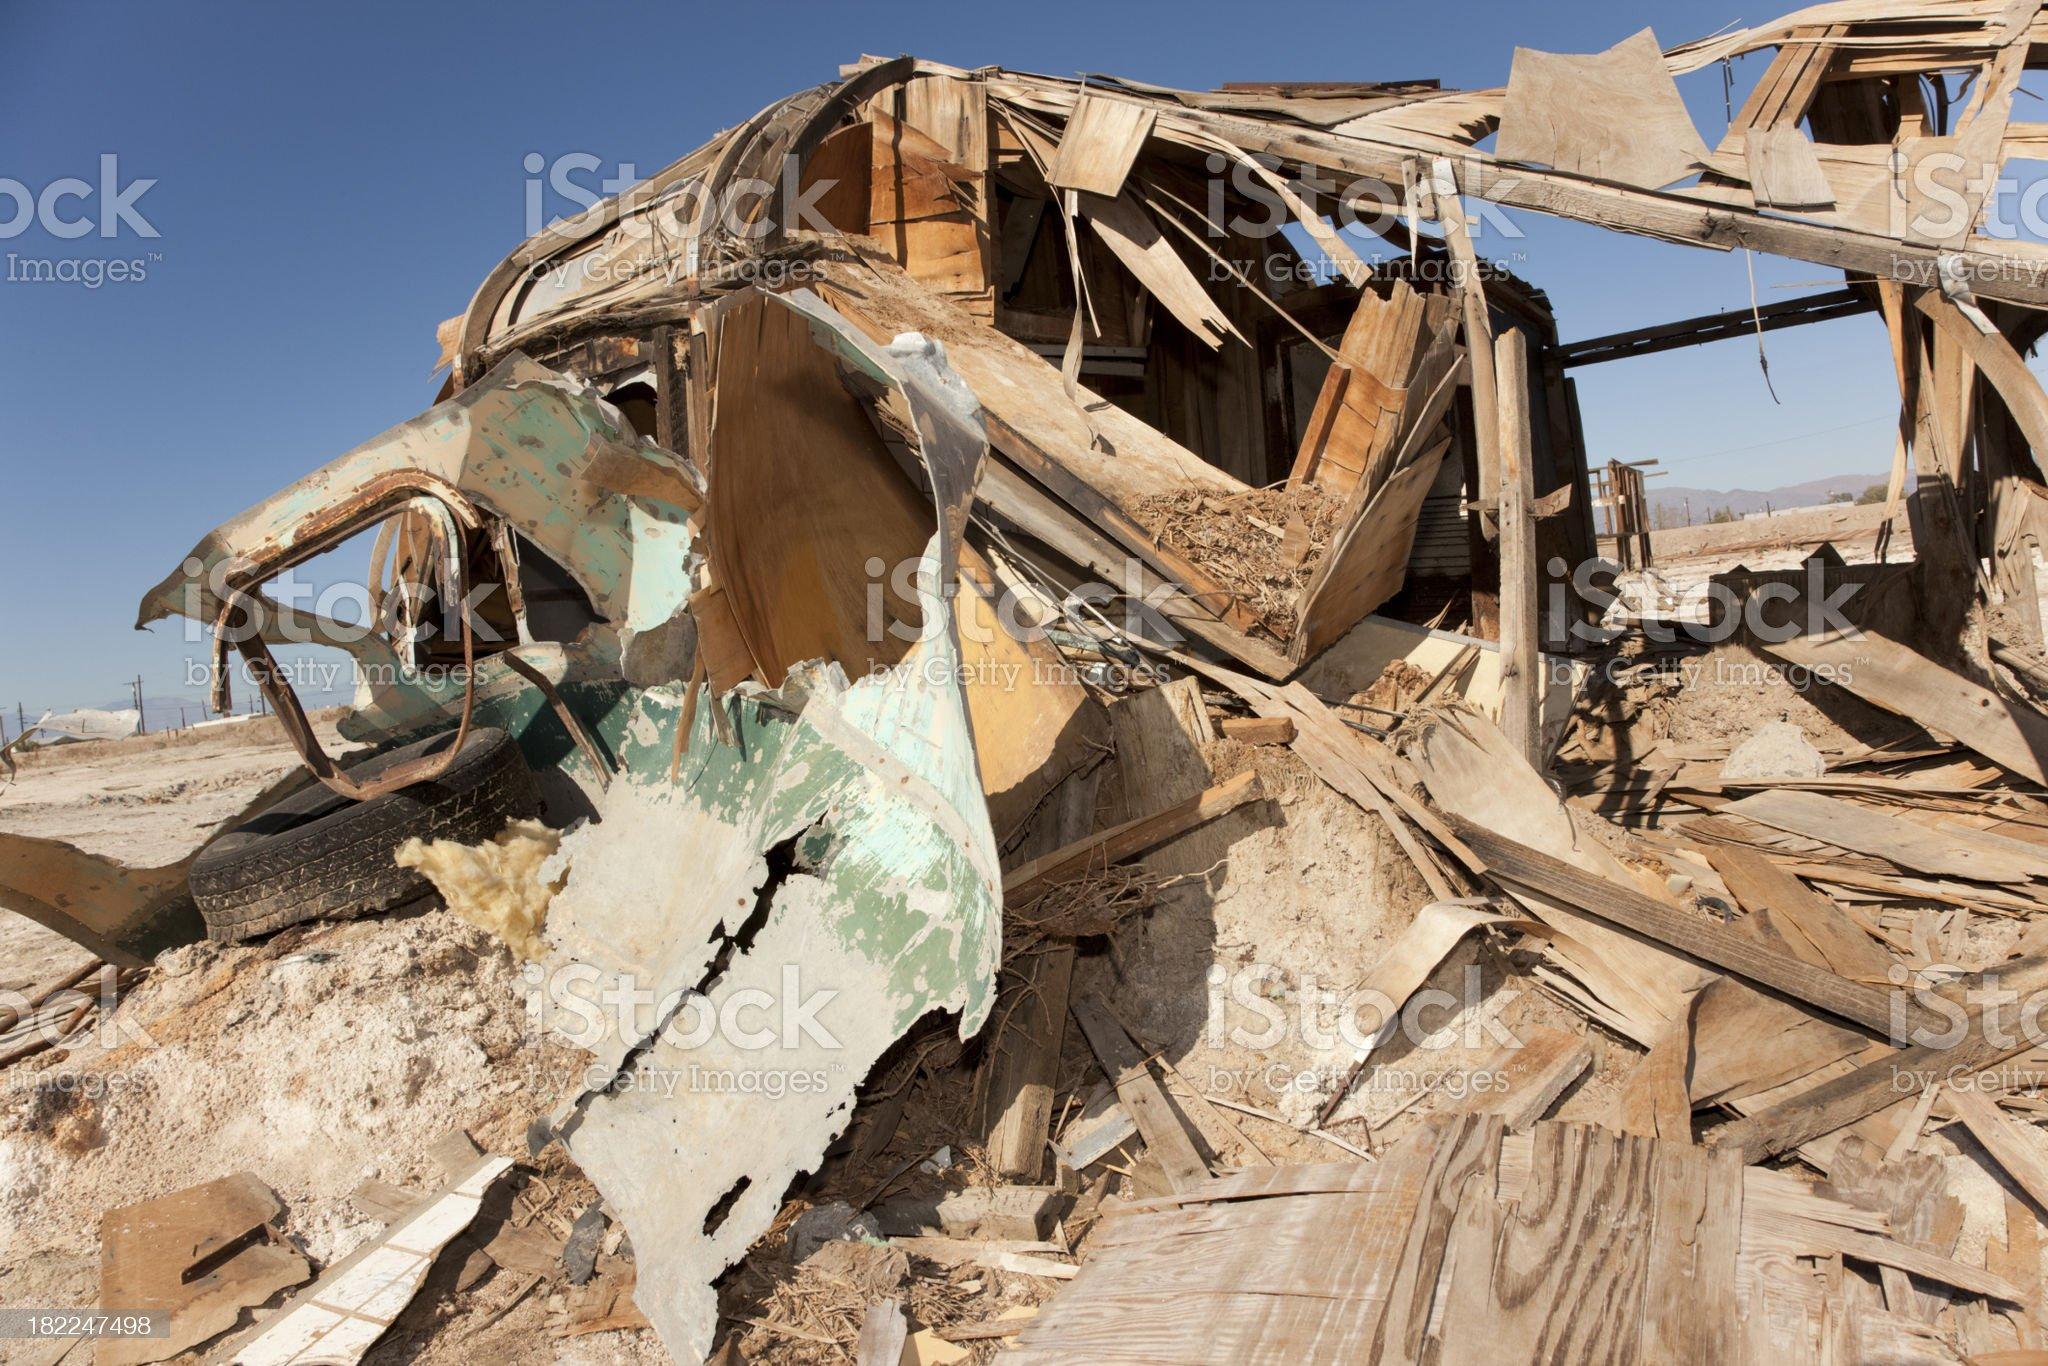 Abandoned Trailer Nearly Destroyed on Salt Flats, Salton Sea, California royalty-free stock photo